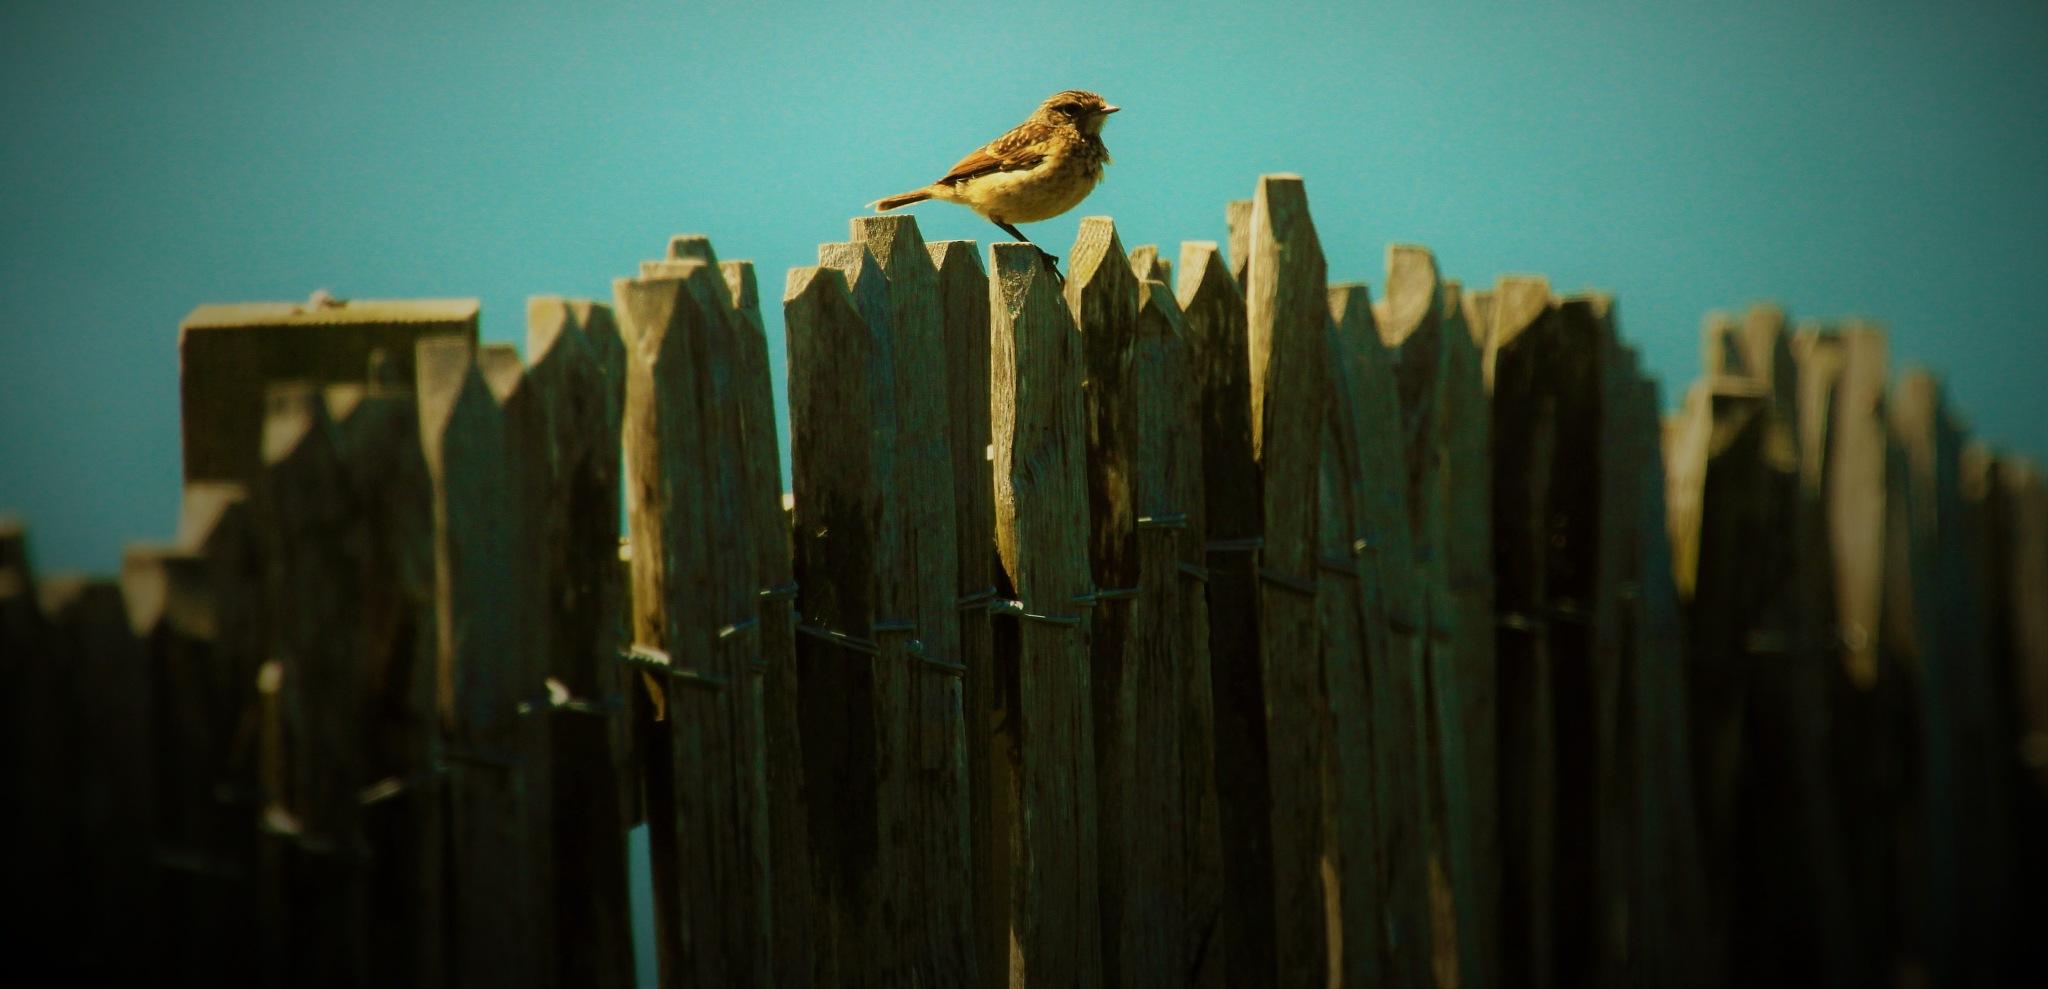 My Perch by AJ Yakstrangler Andy Jamieson